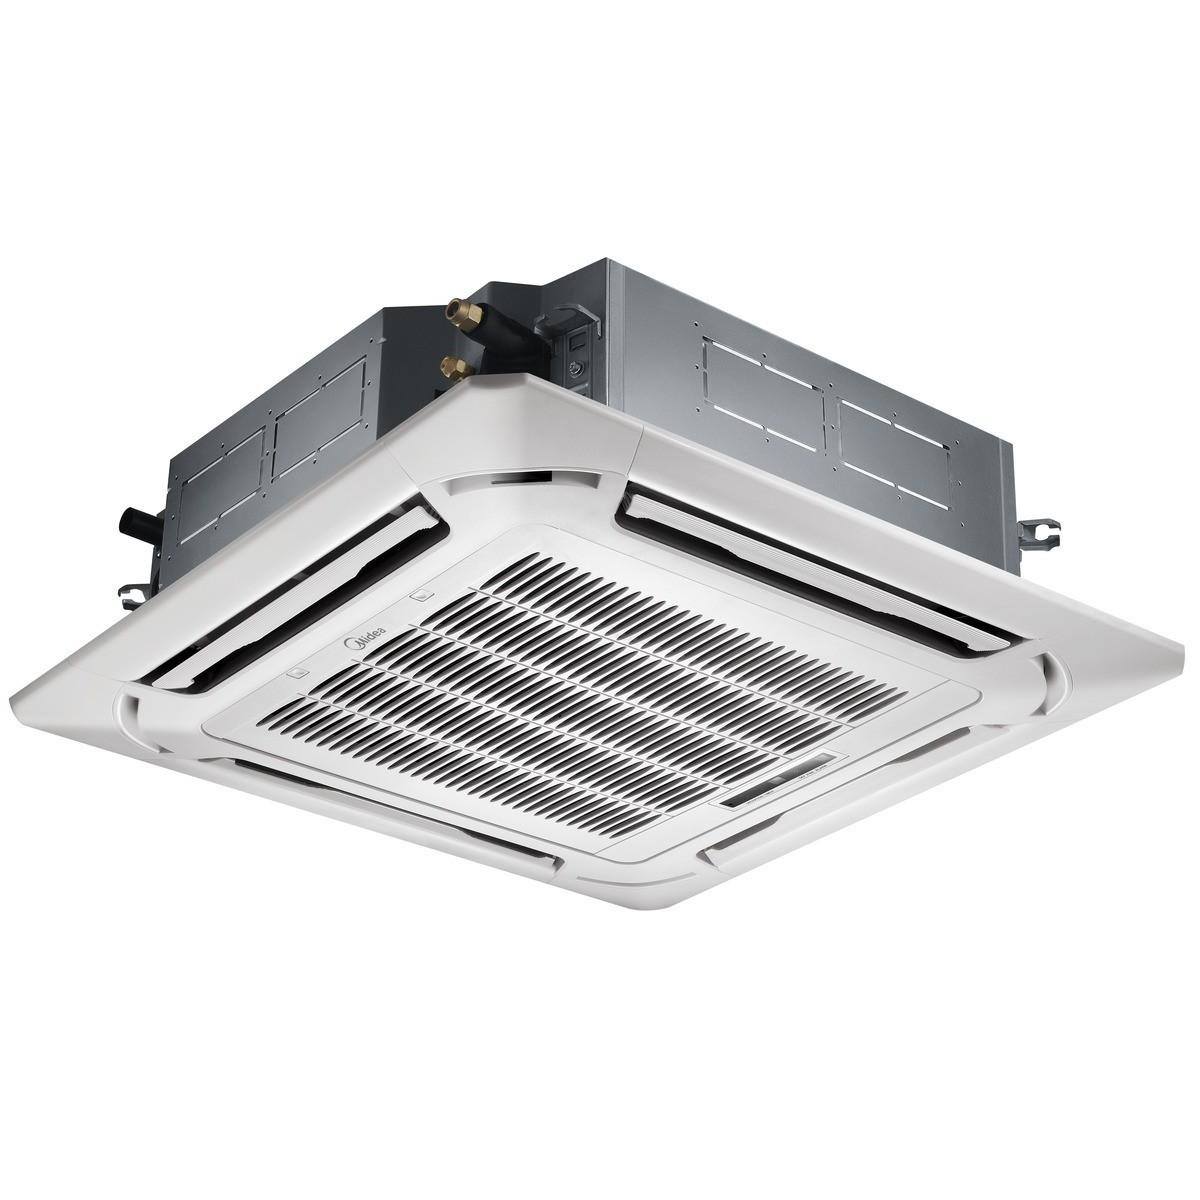 Midea Κλιματιστικό Κασέτα Slim Οροφής MCD 24kBTU 1Phase